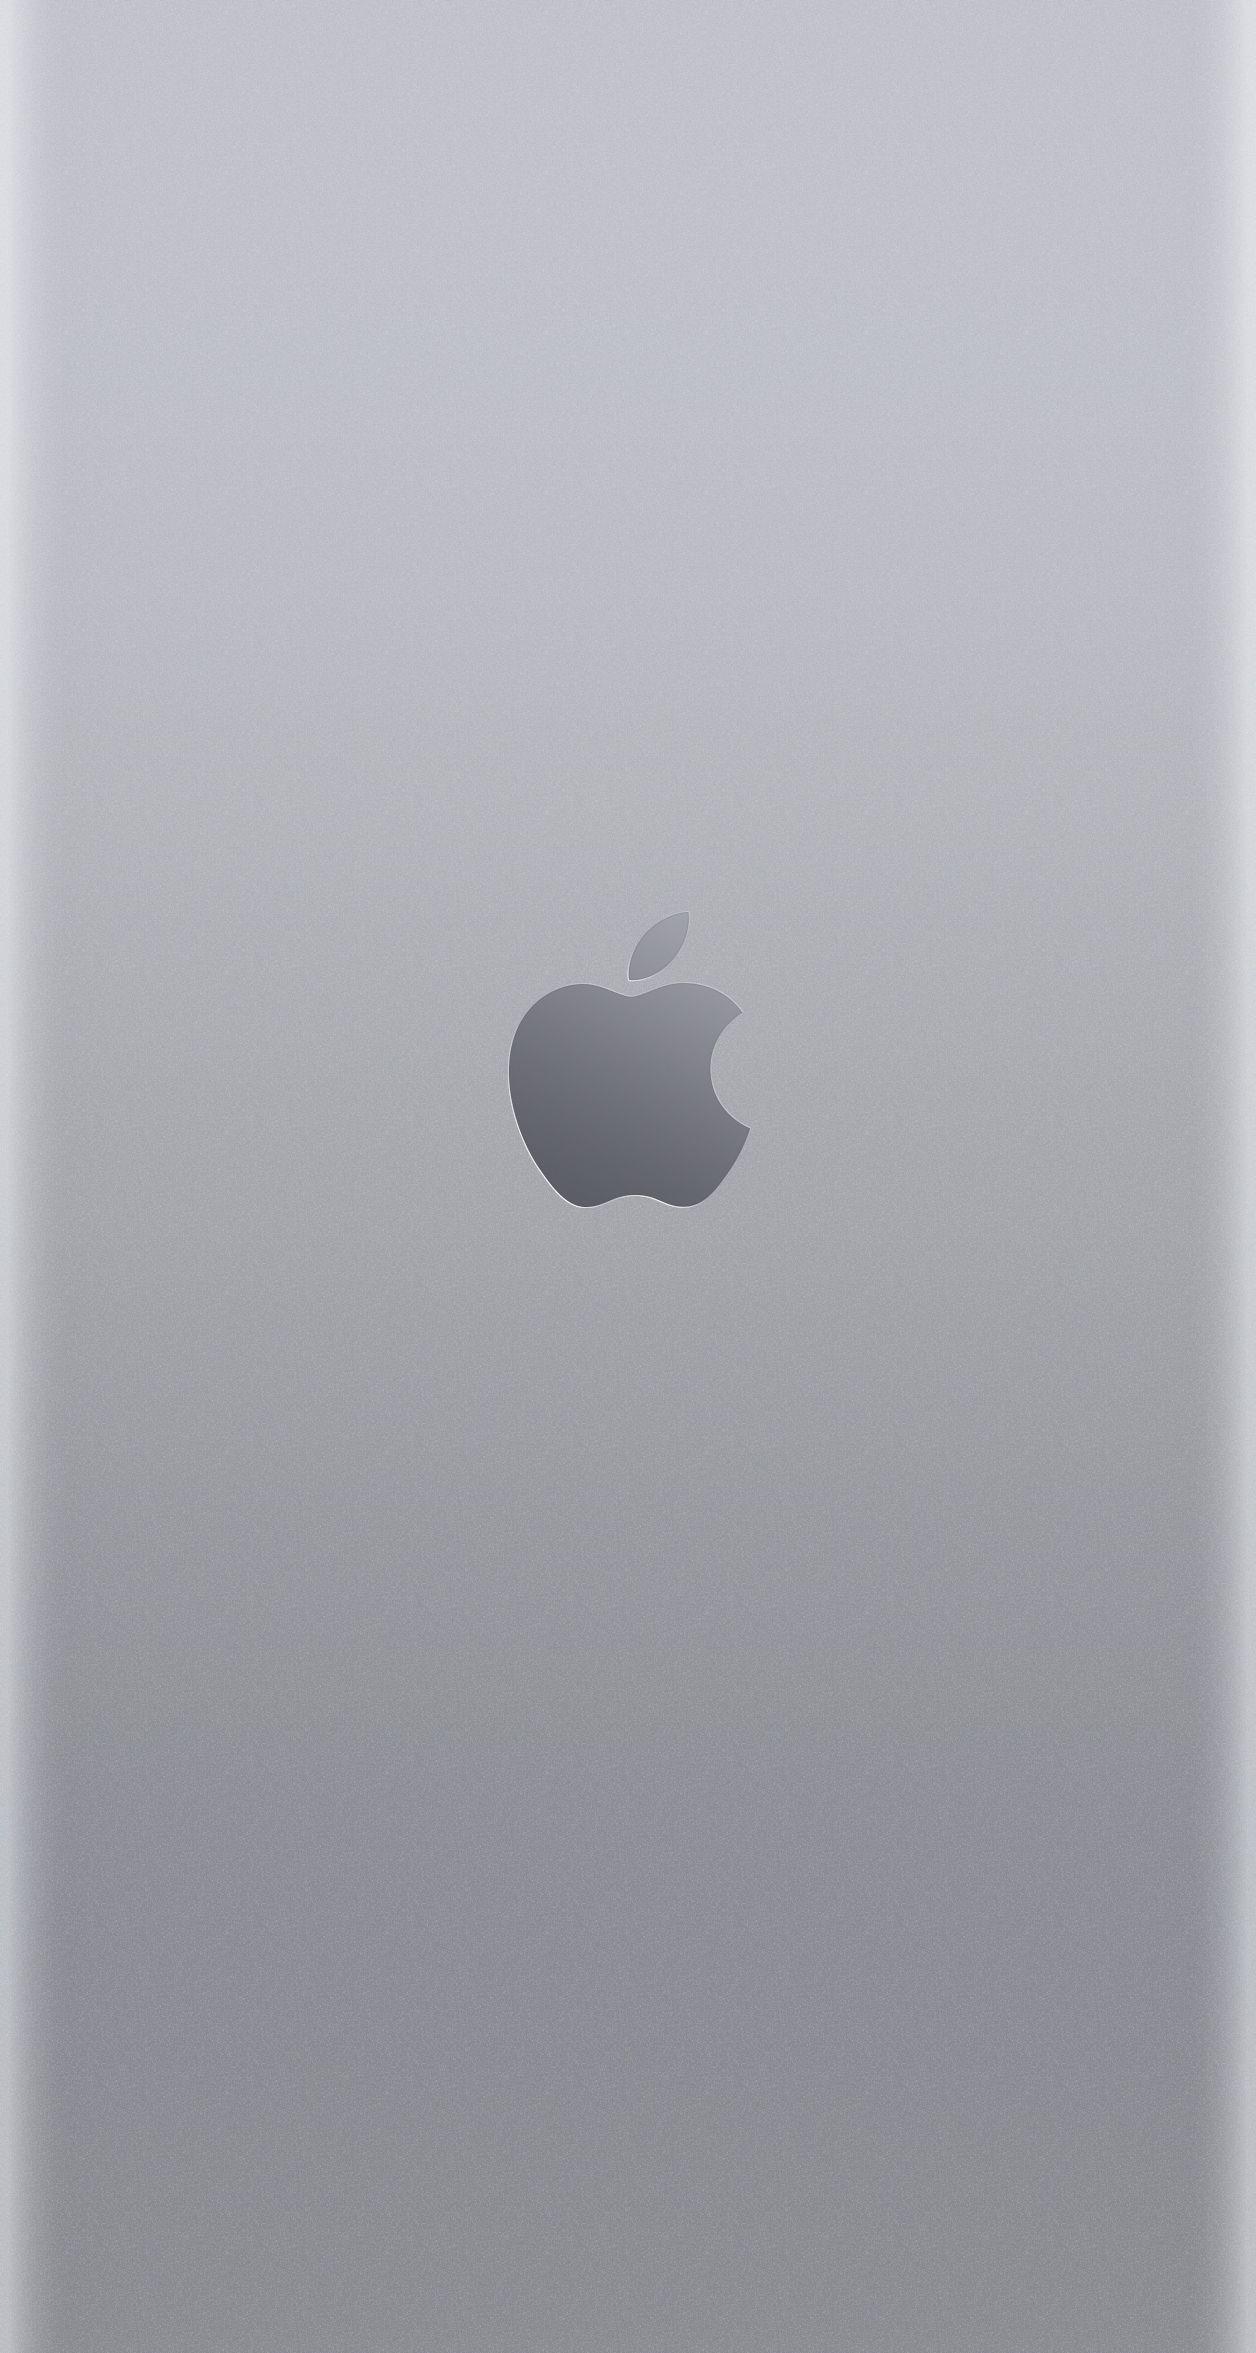 iphone 6s gratuit belgique